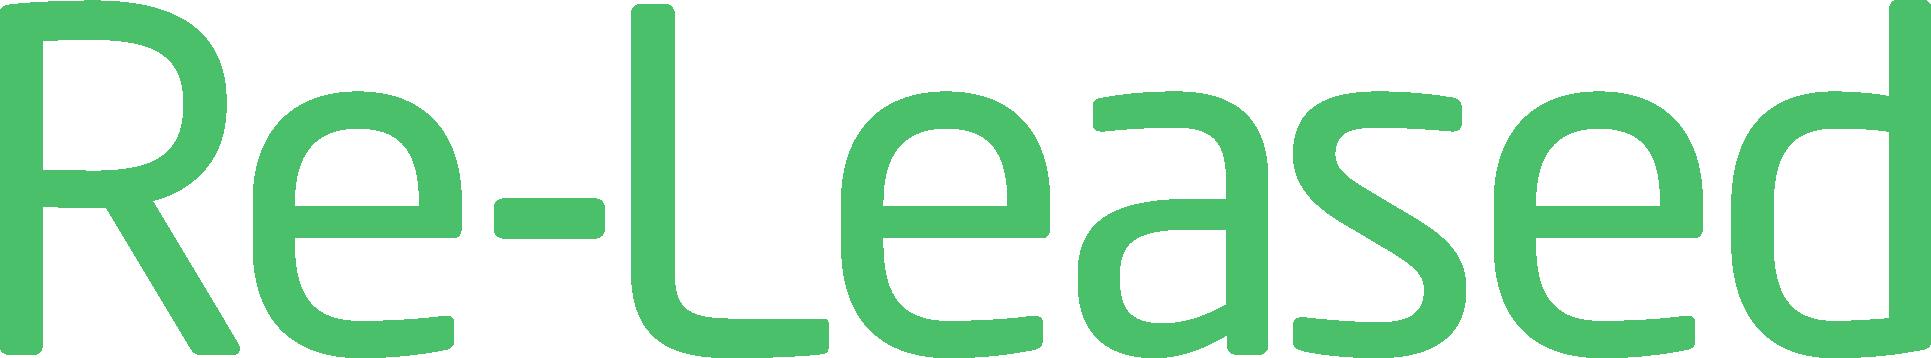 Logo-green-horizontal-RGB.EPS